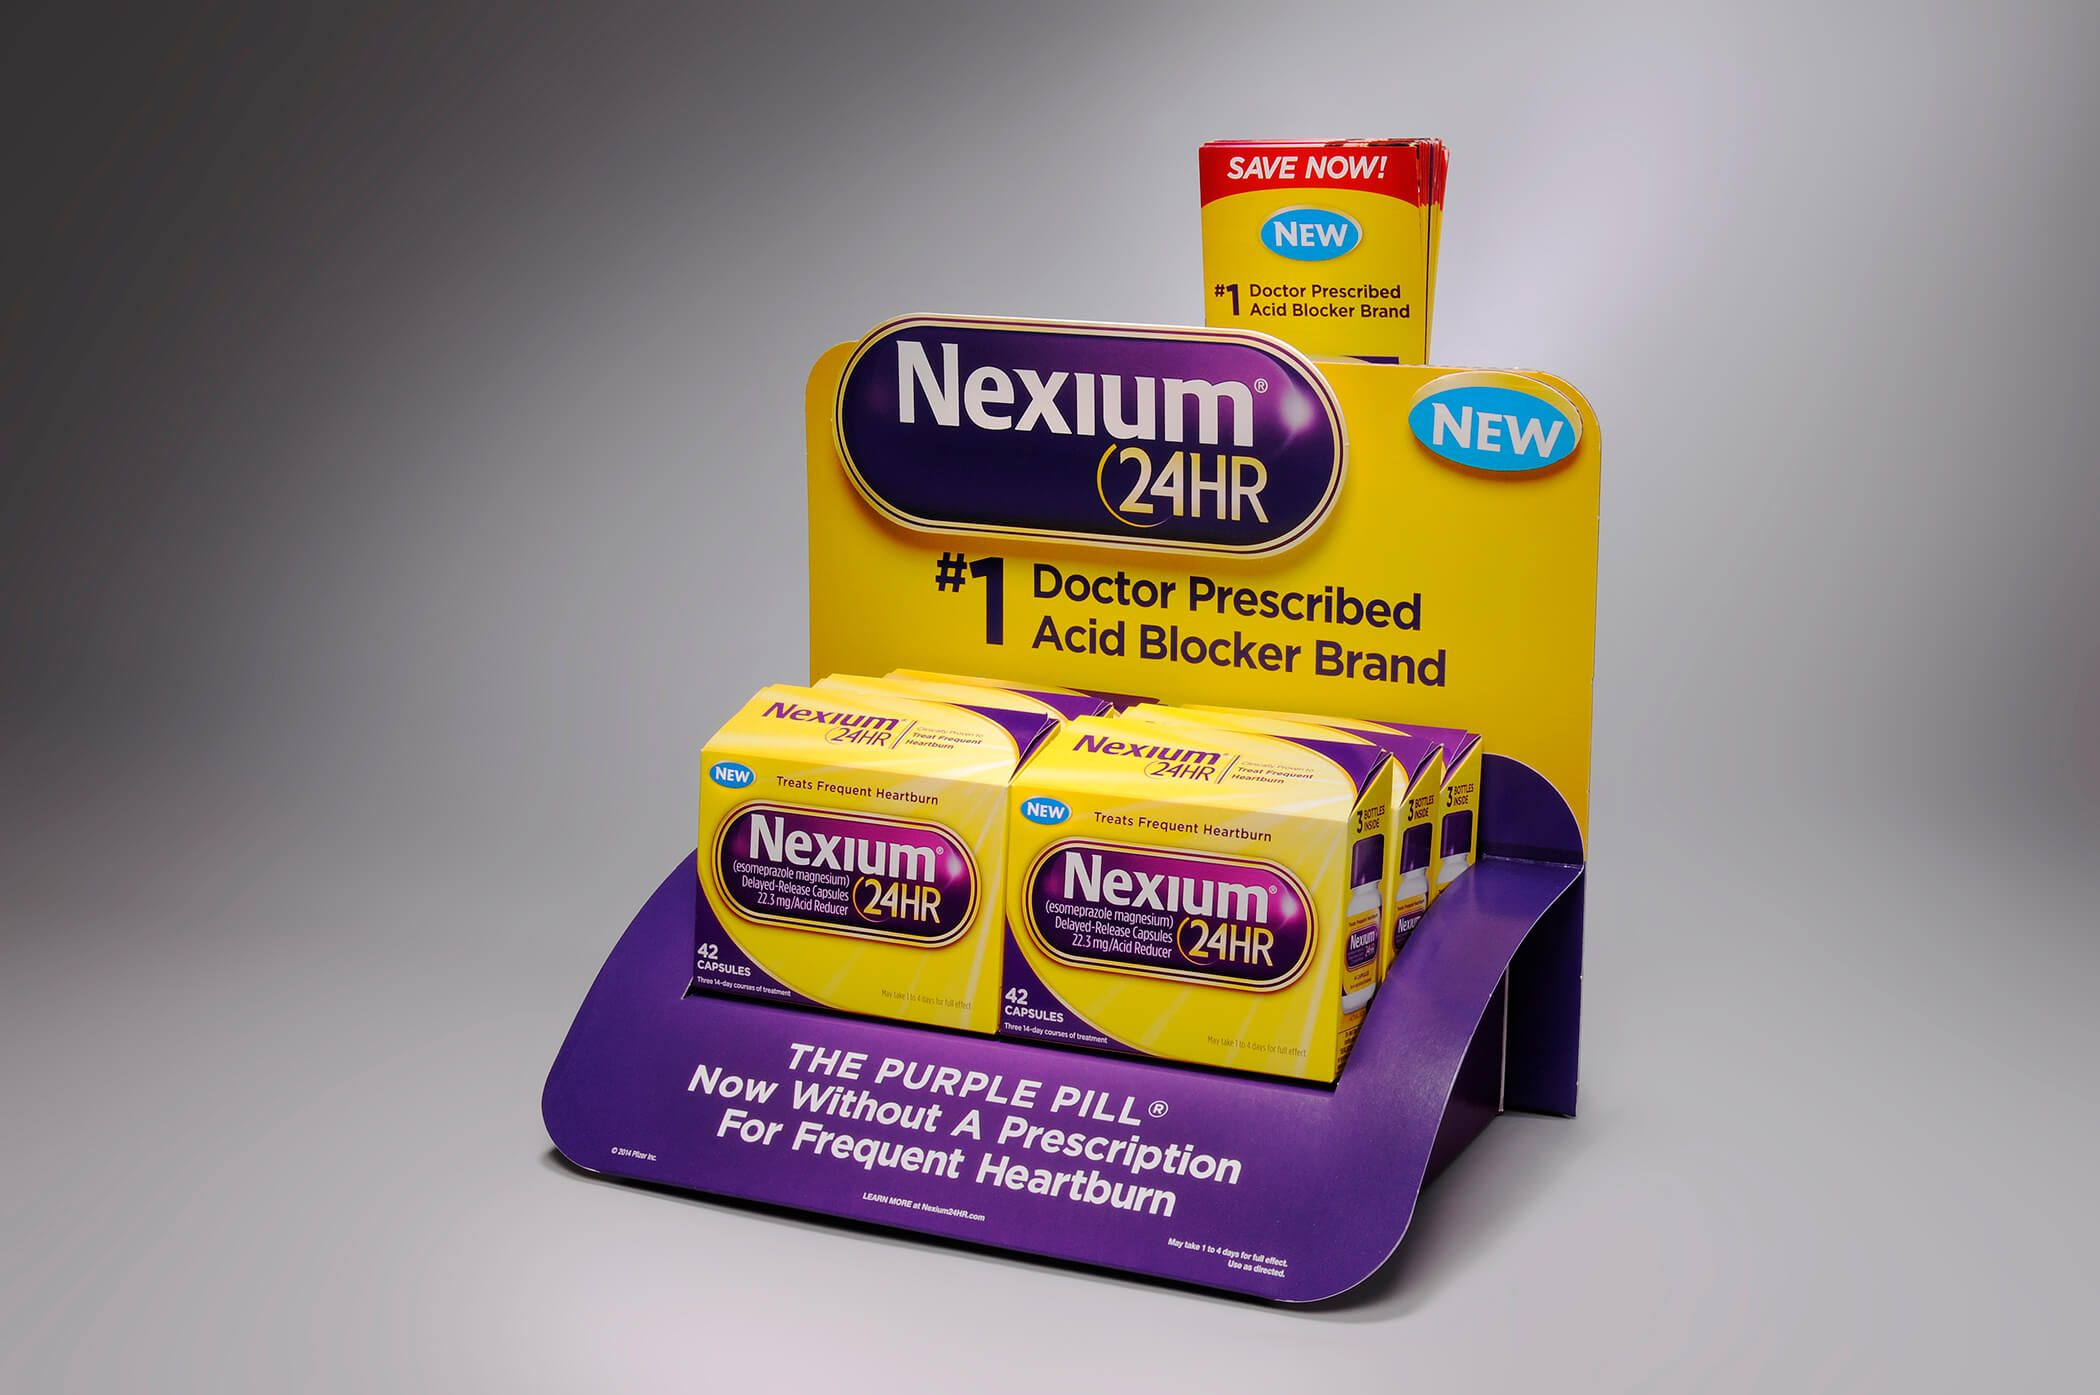 Nexium Product Retail Display Countertop Display Cardboard